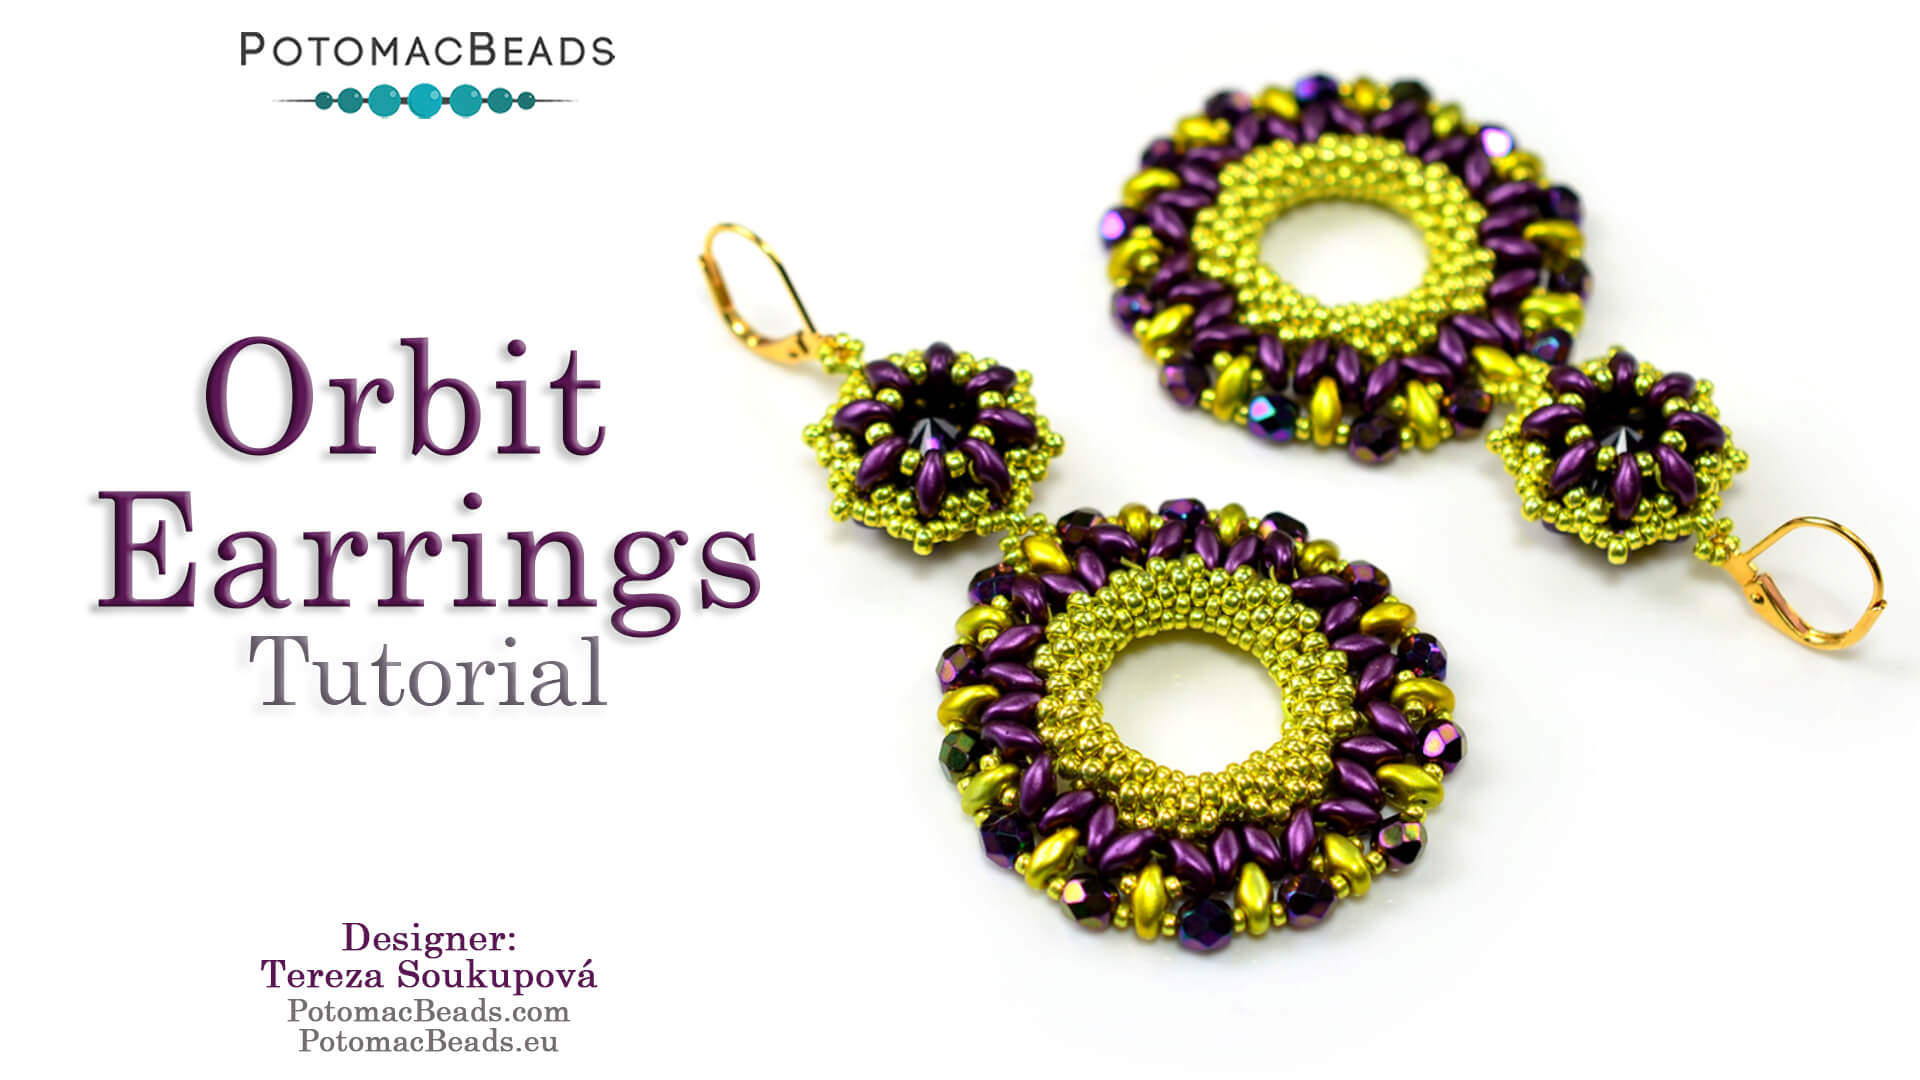 How to Bead / Videos Sorted by Beads / SuperDuo & MiniDuo Videos / Orbit Earrings Tutorial